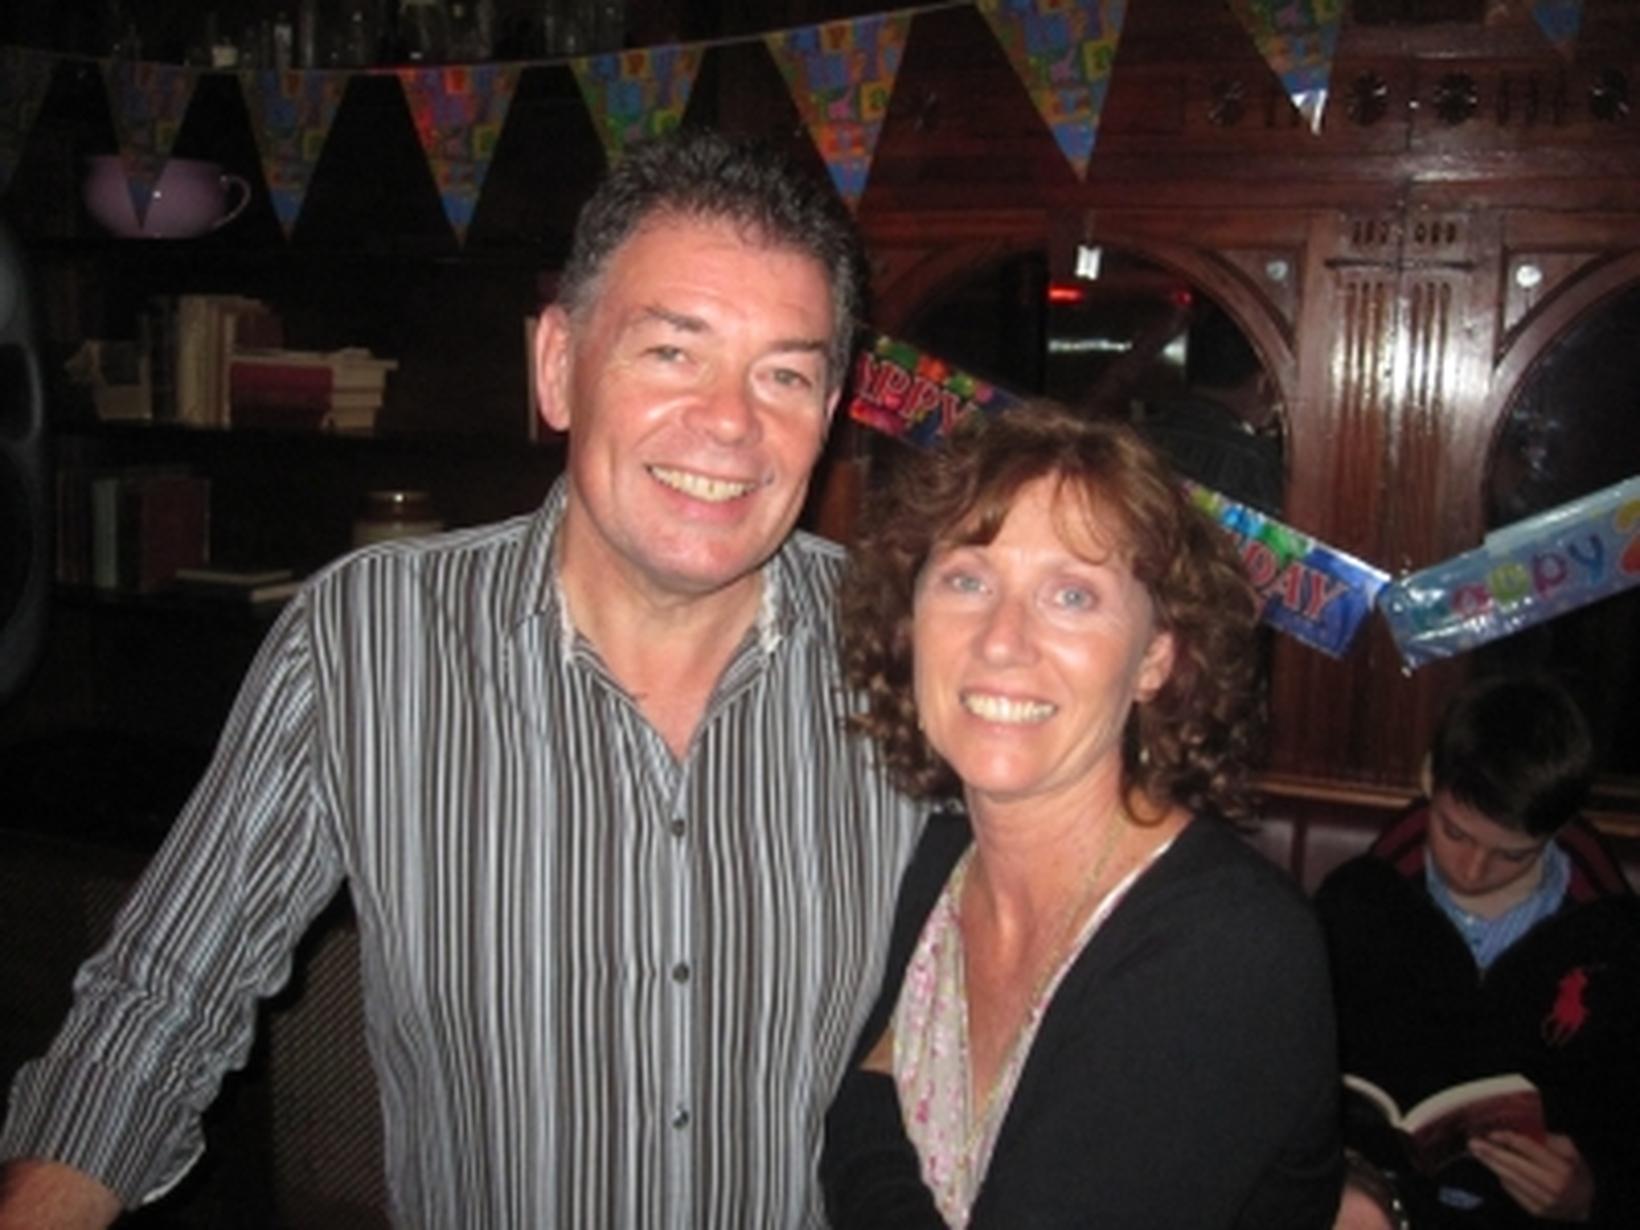 Derek & Freda from Blaxland, New South Wales, Australia